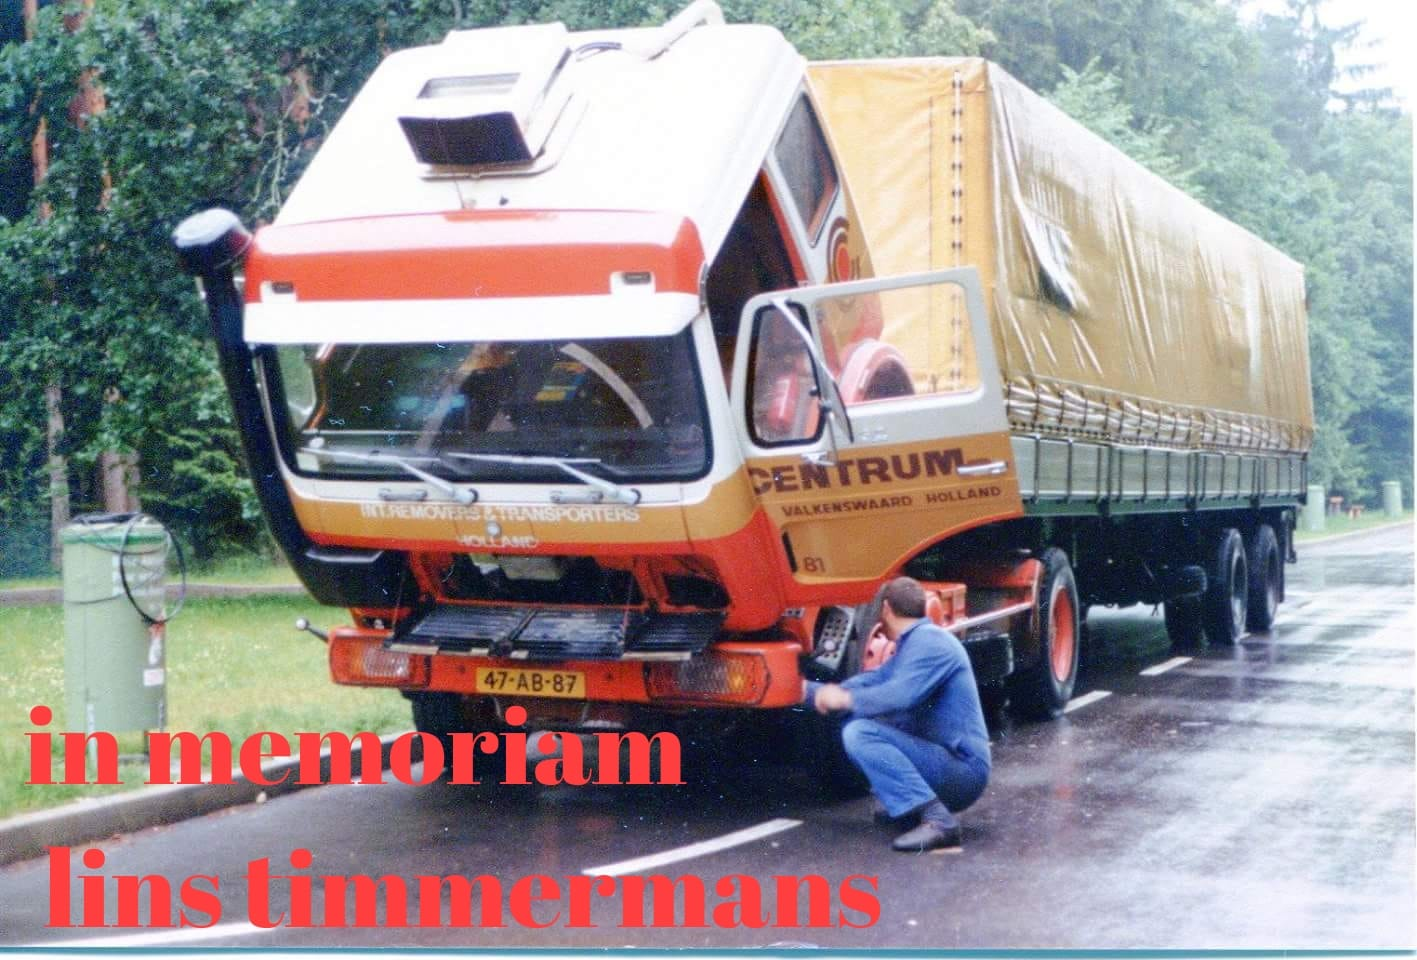 RIP-Lins-Timmermans